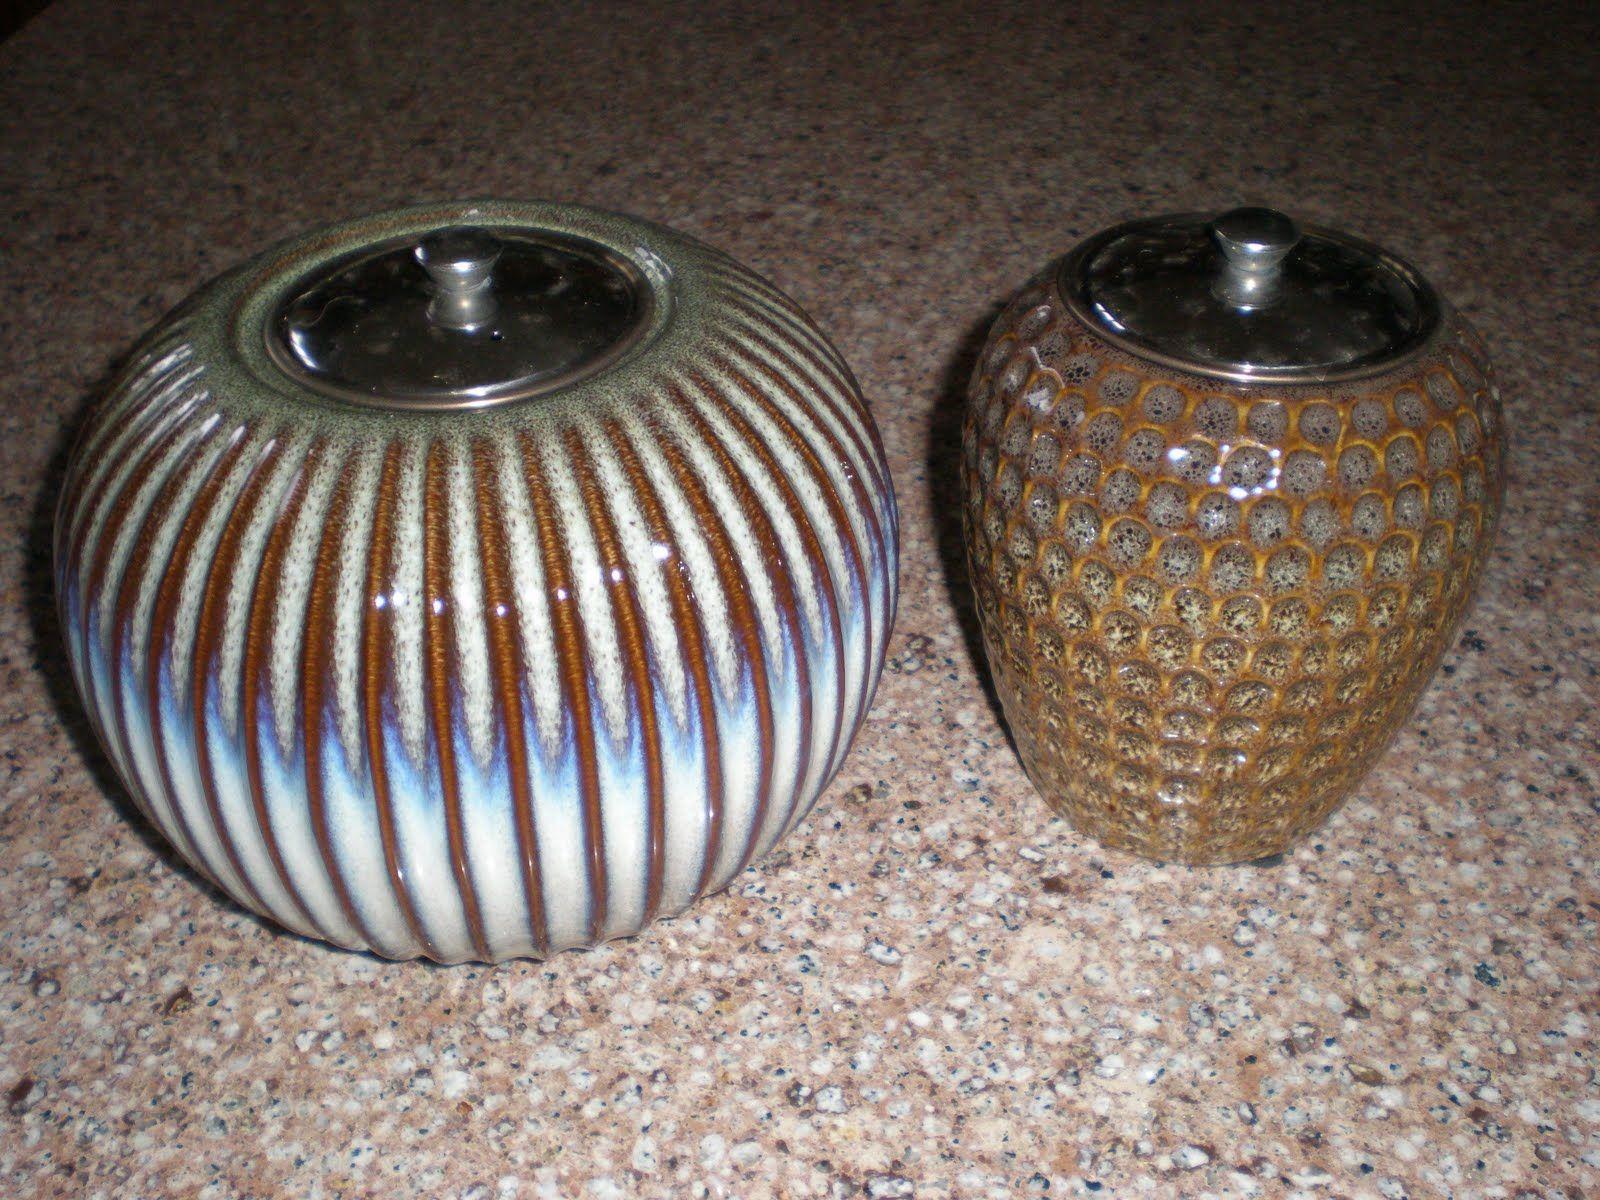 Sweetwater Style: DYI Ceramic Firepots!